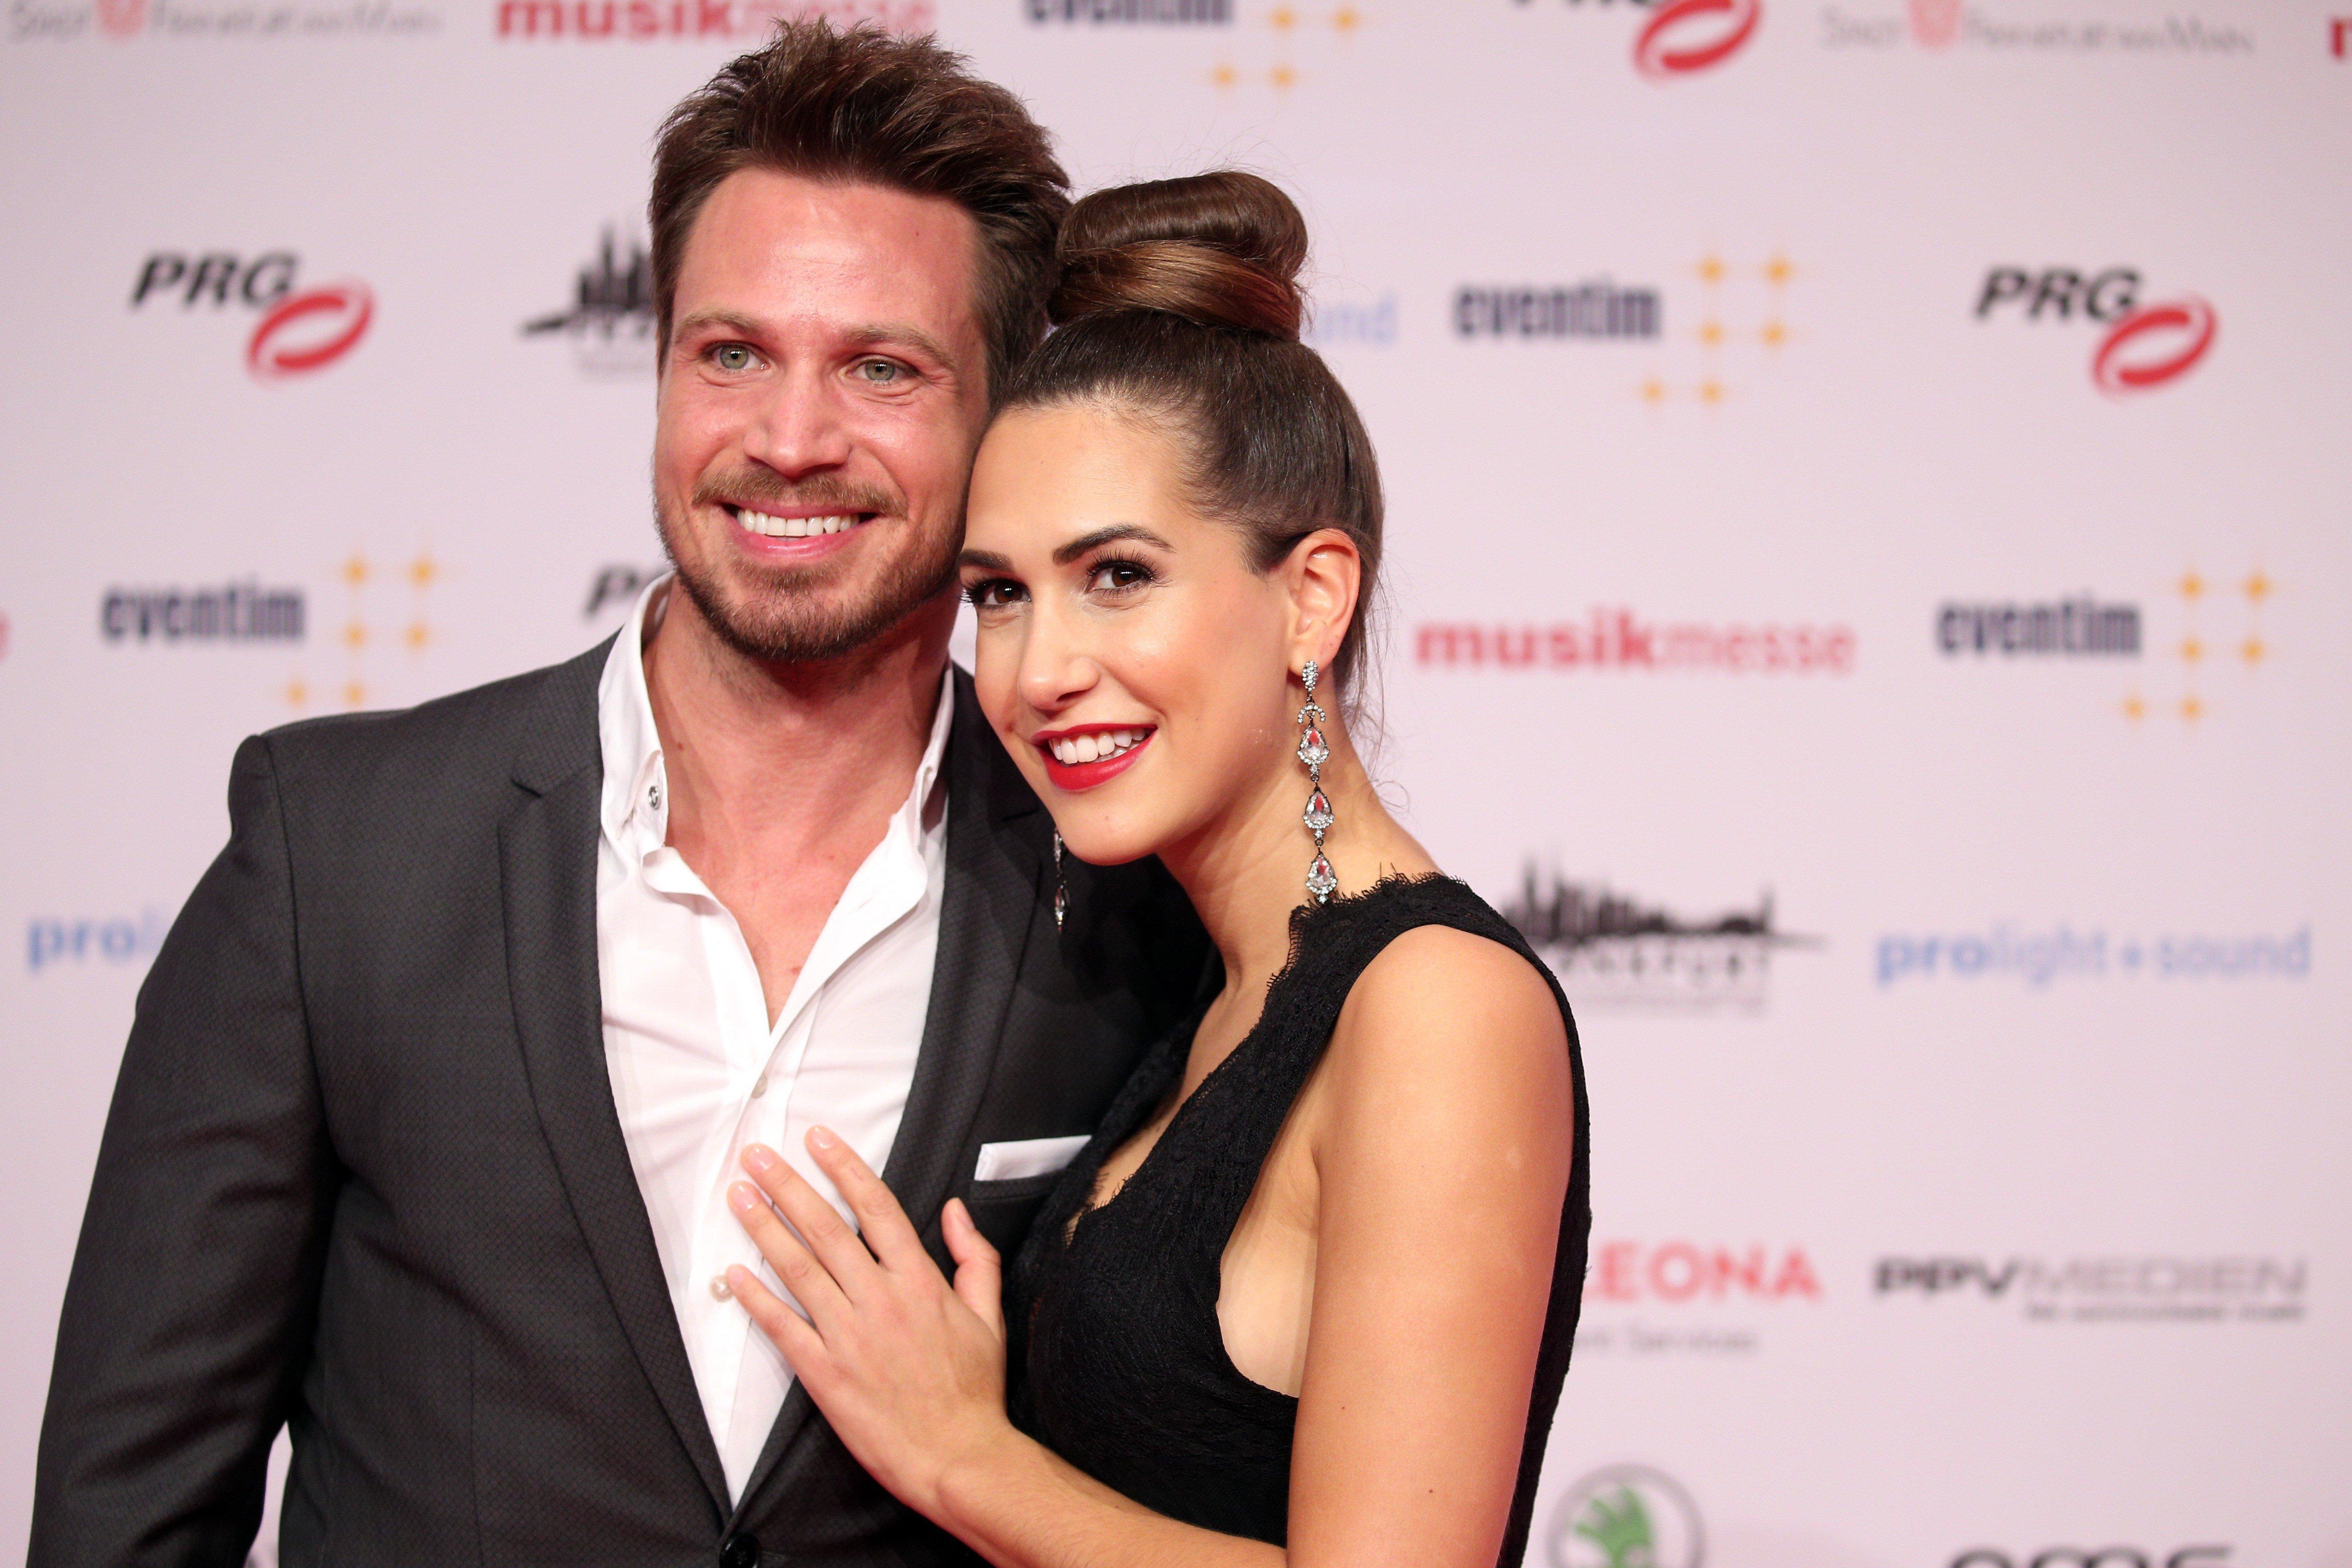 Sebastian Pannek Und Clea Lacy Bachelor Paar Hat Sich Getrennt